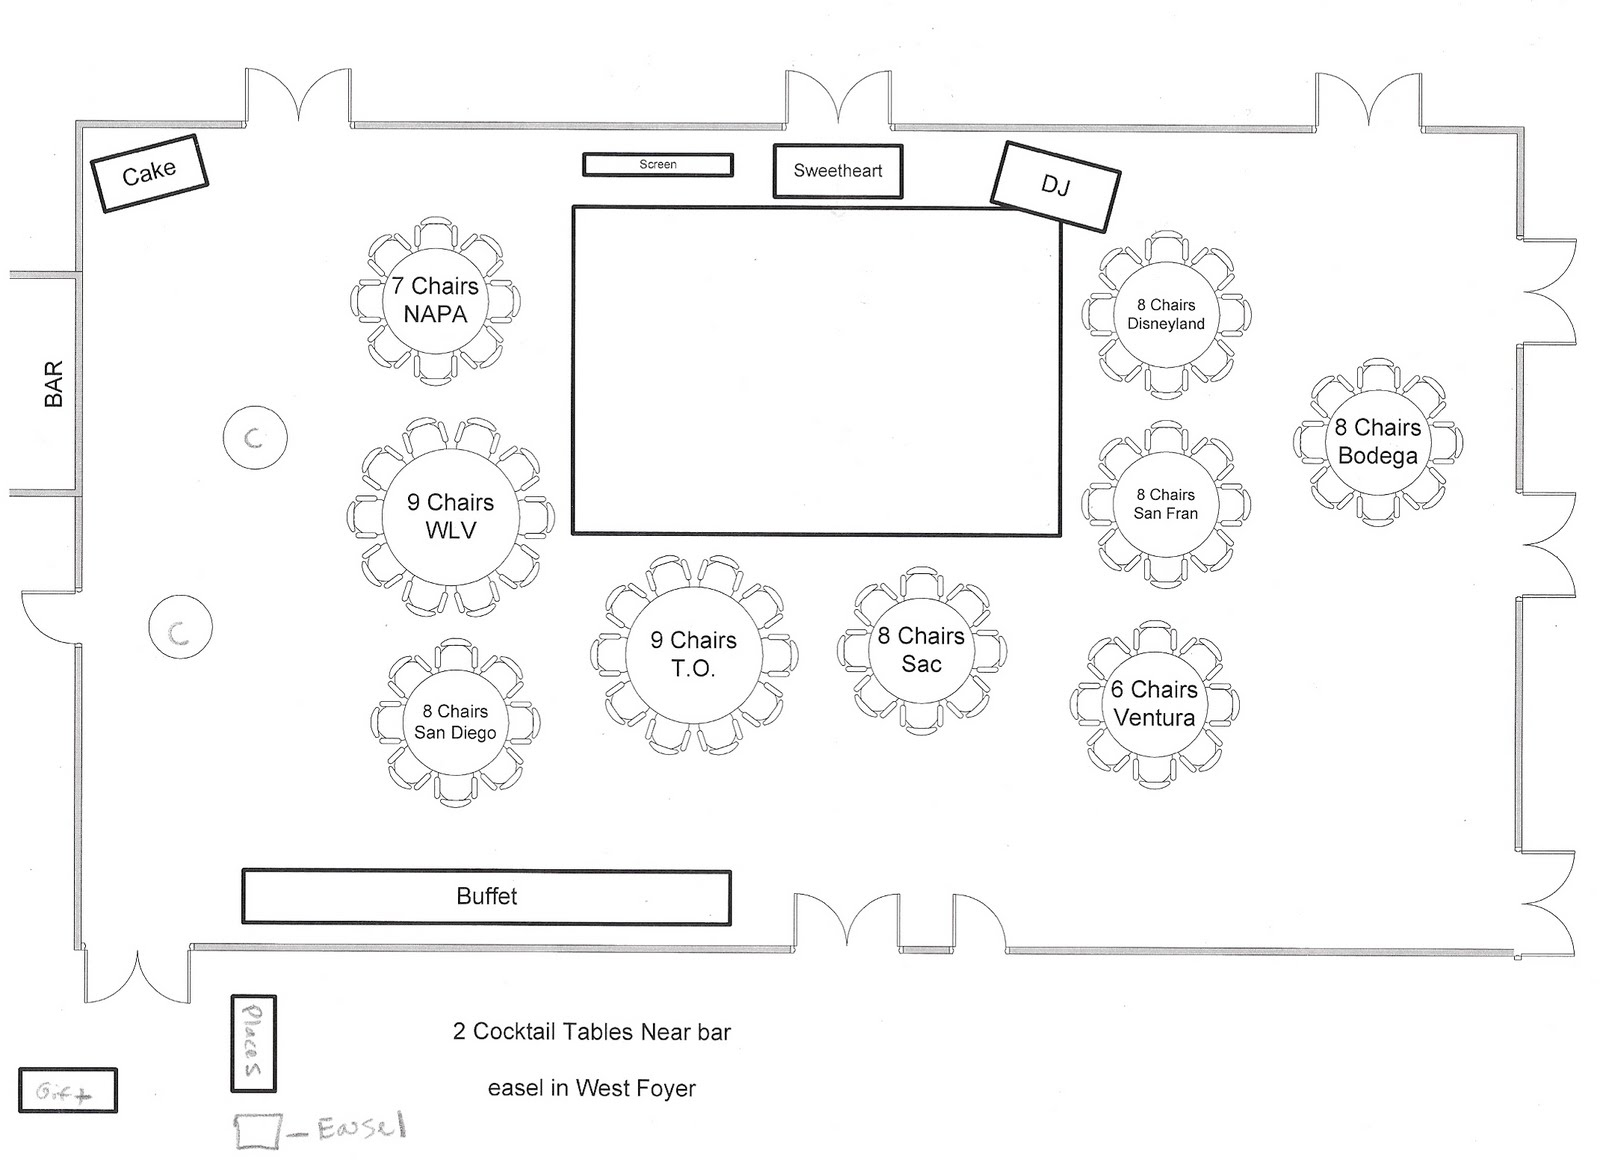 Bicoastal Bride Sweet Seats Seating Chart Amp Venue Layout